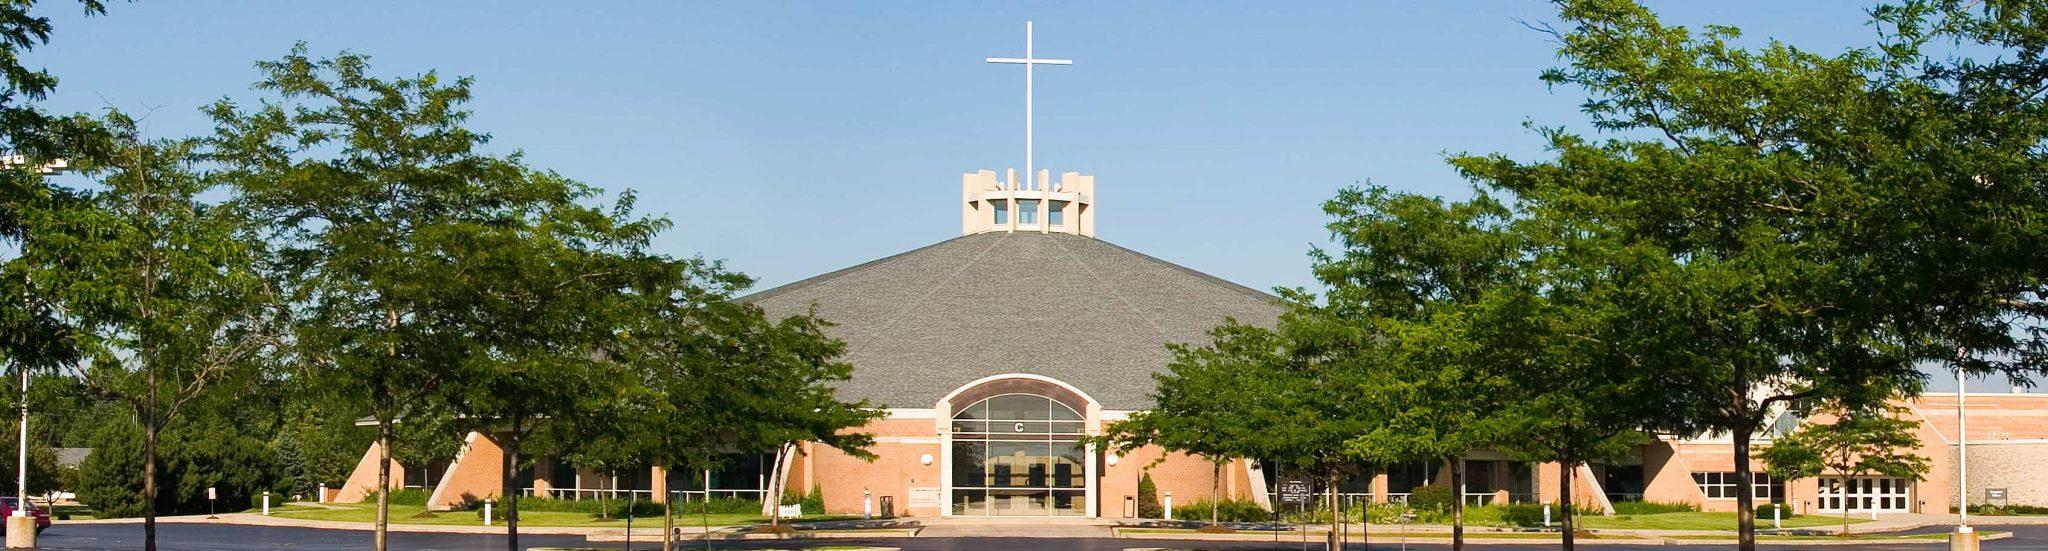 St  Mary Immaculate Parish - St  Mary Immaculate Parish